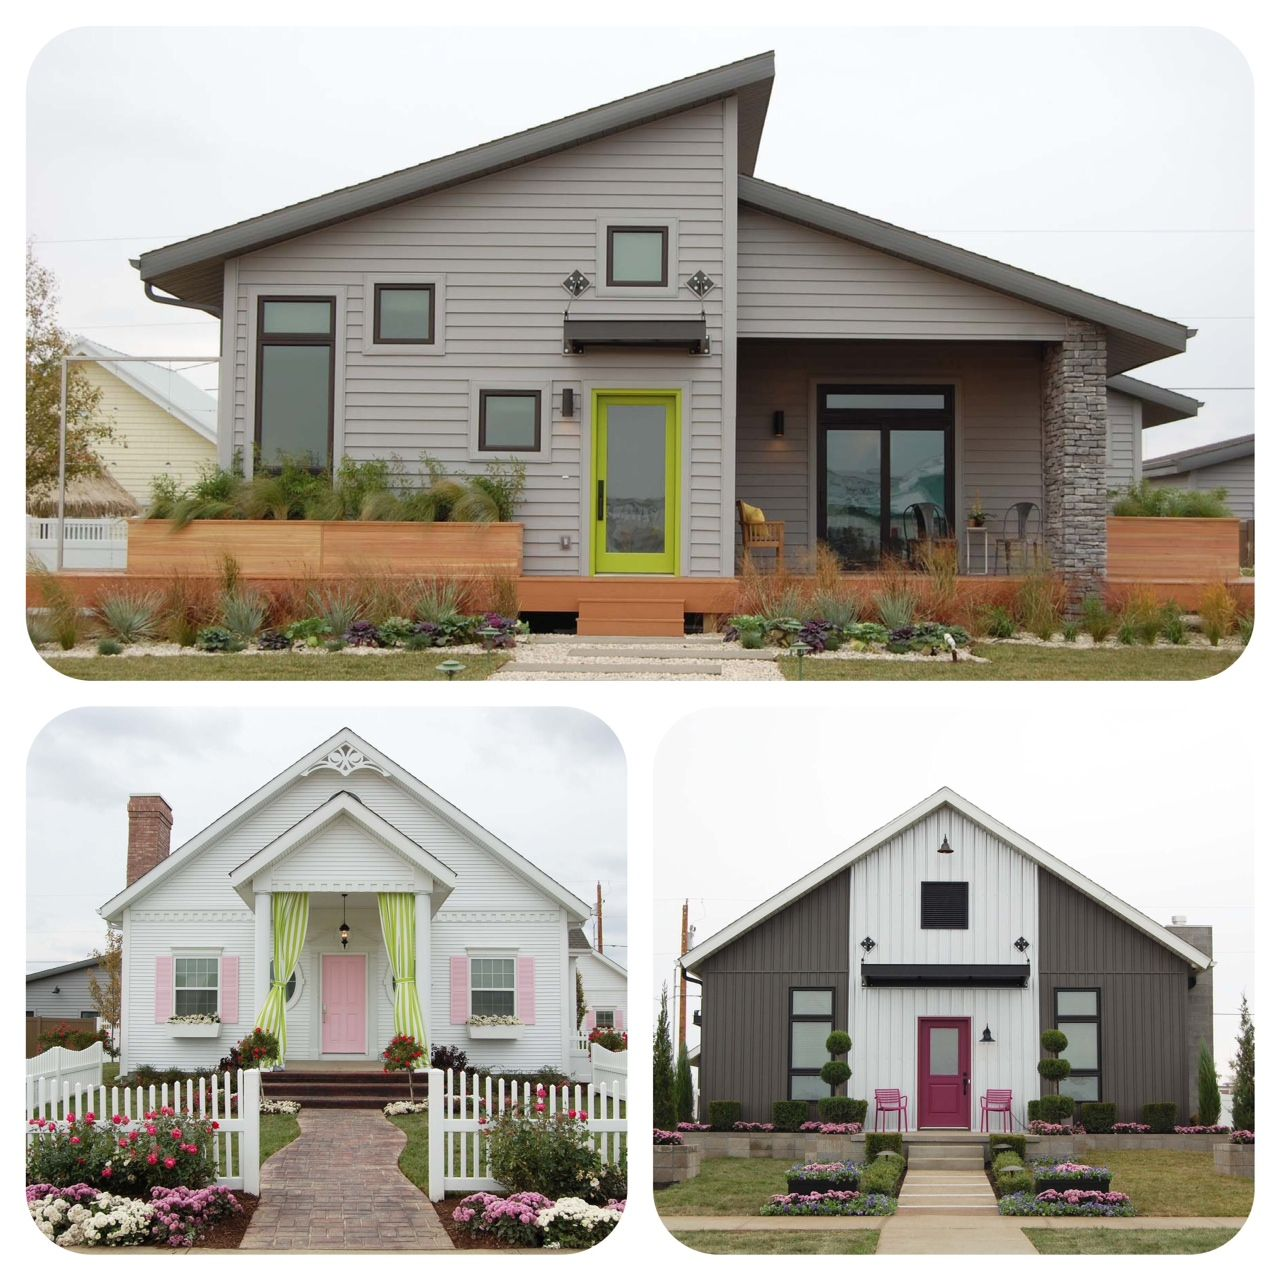 Joplin Missouri Extreme Makeover Home Edition 7 Houses 7